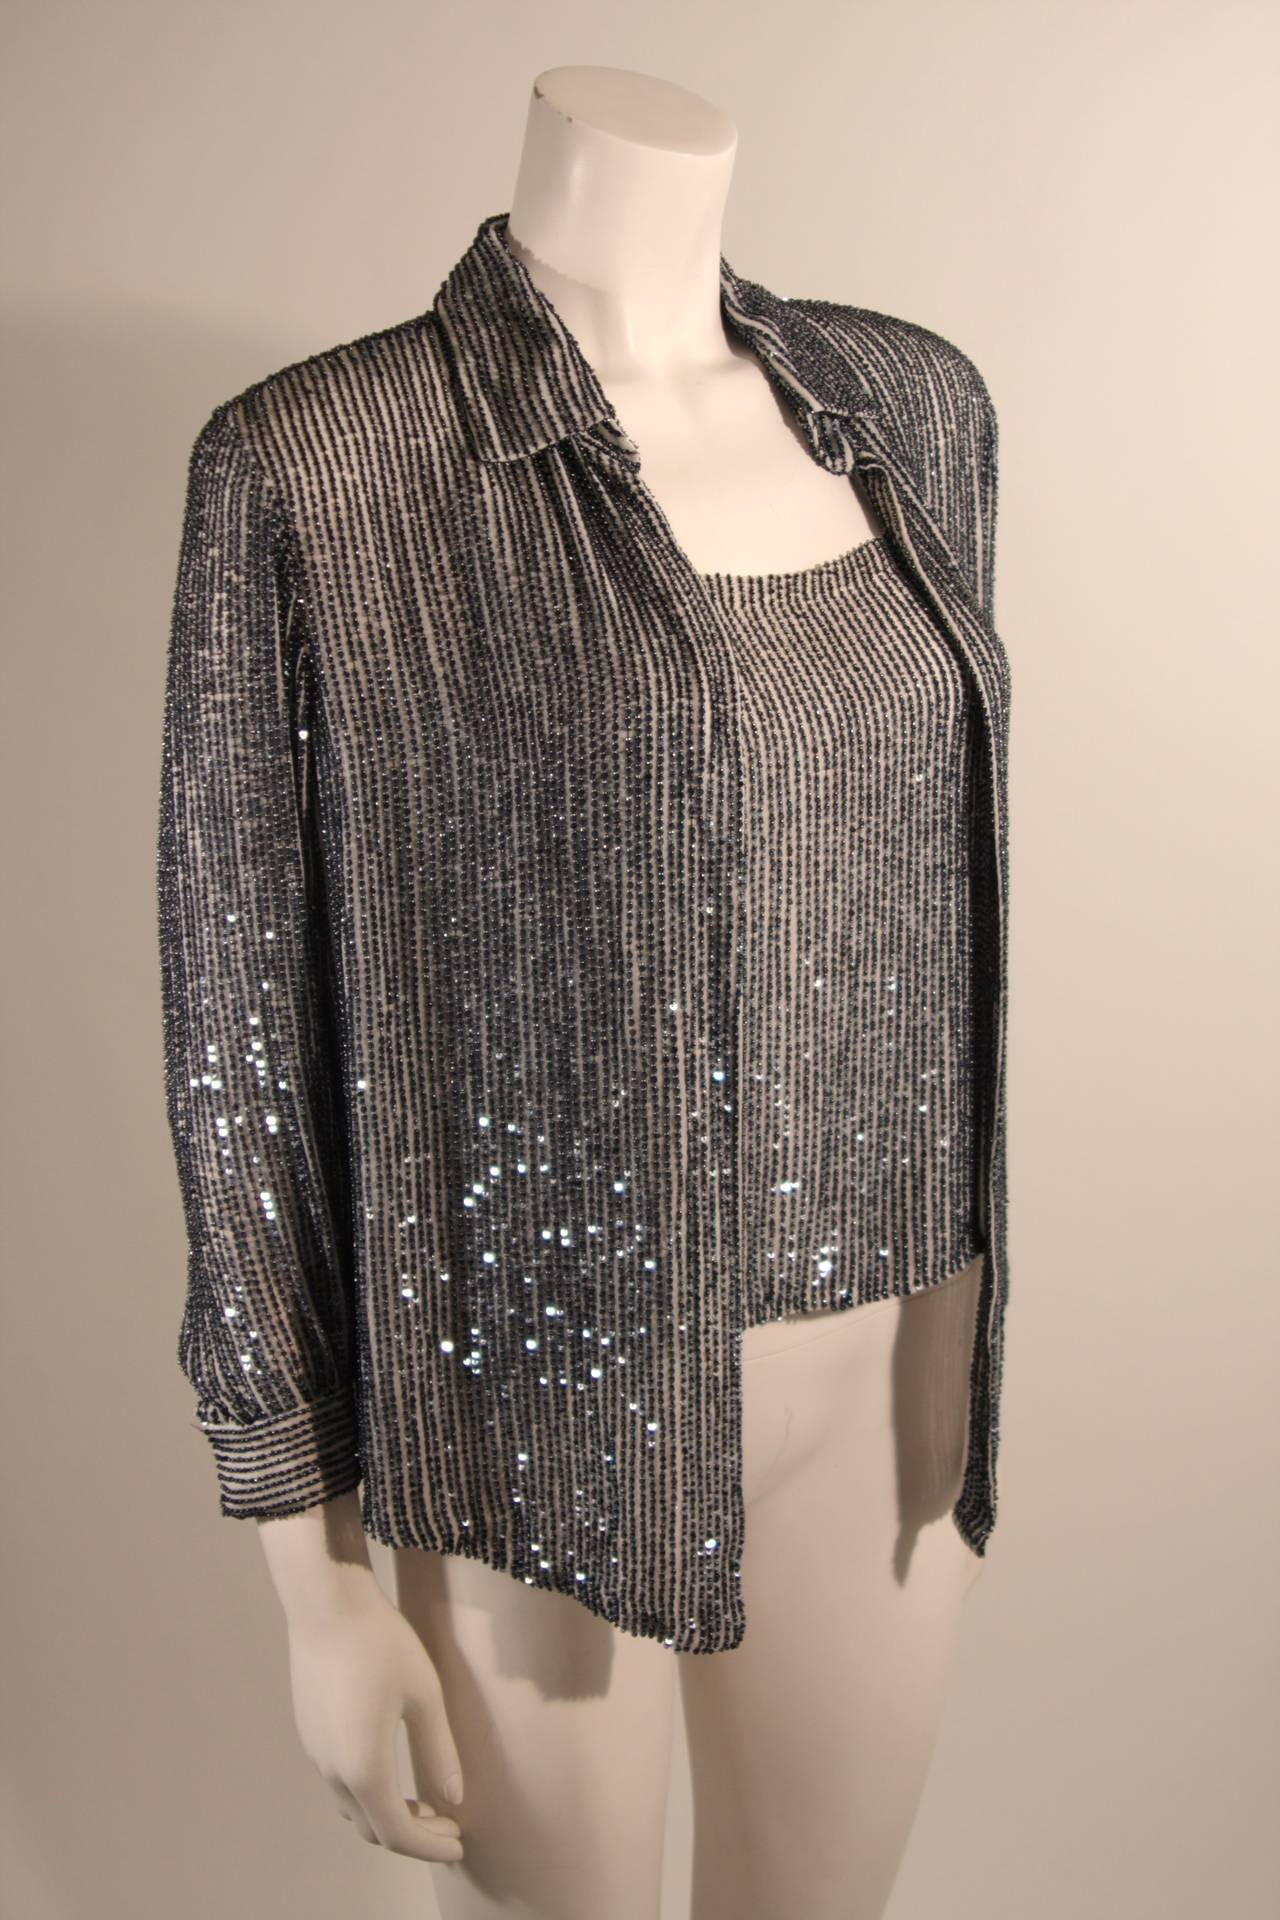 Black Oscar De La Renta Evening Blouse and Camisole Size 8 For Sale